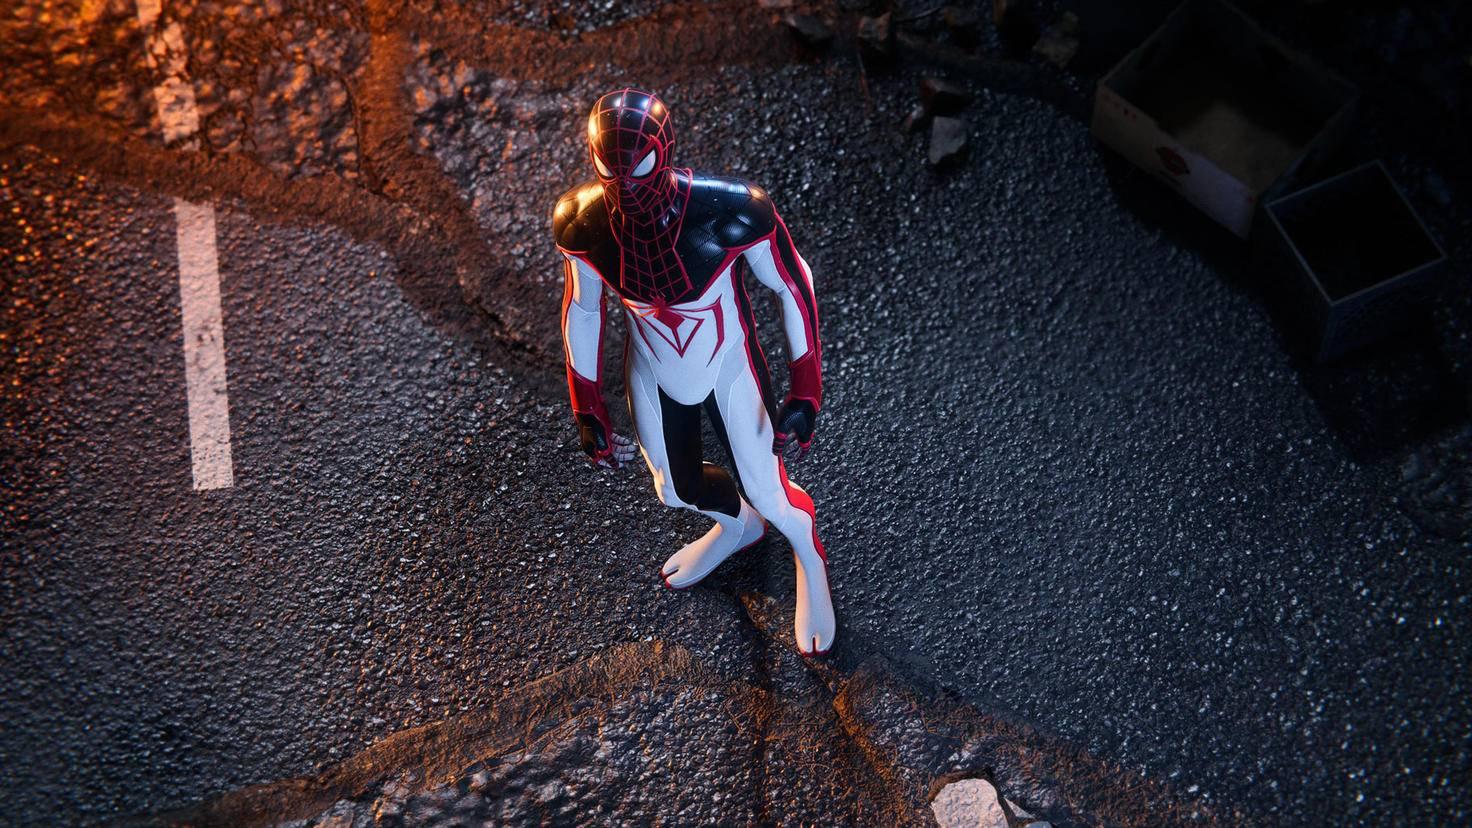 ps5-spider-man-miles-morales-screenshot